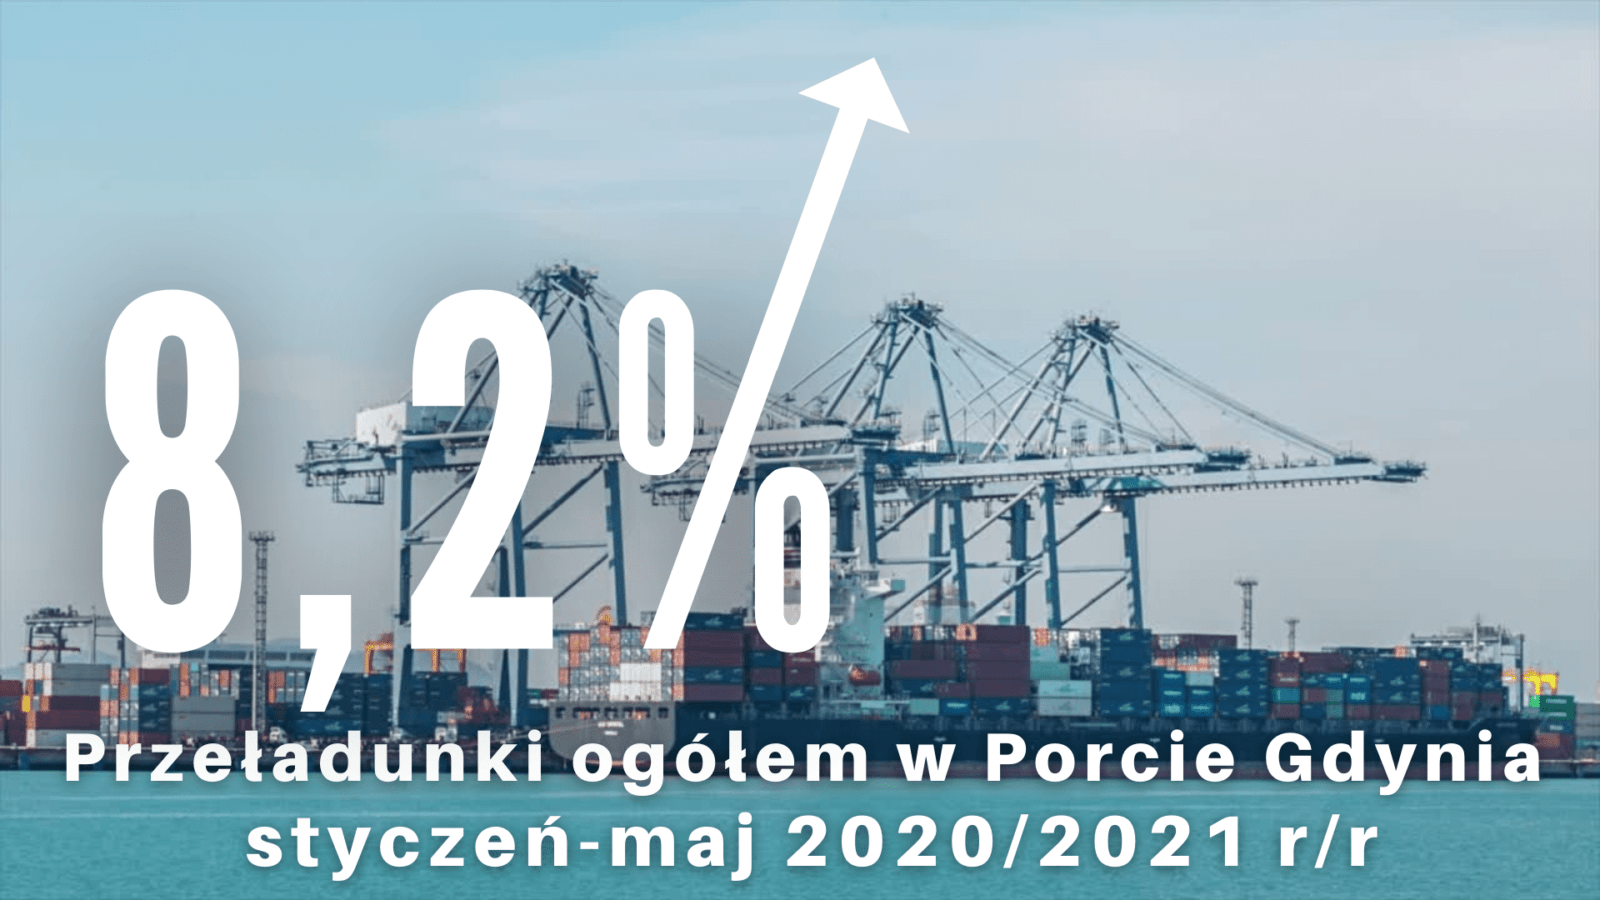 Wzrost eksportu w transporcie morskim